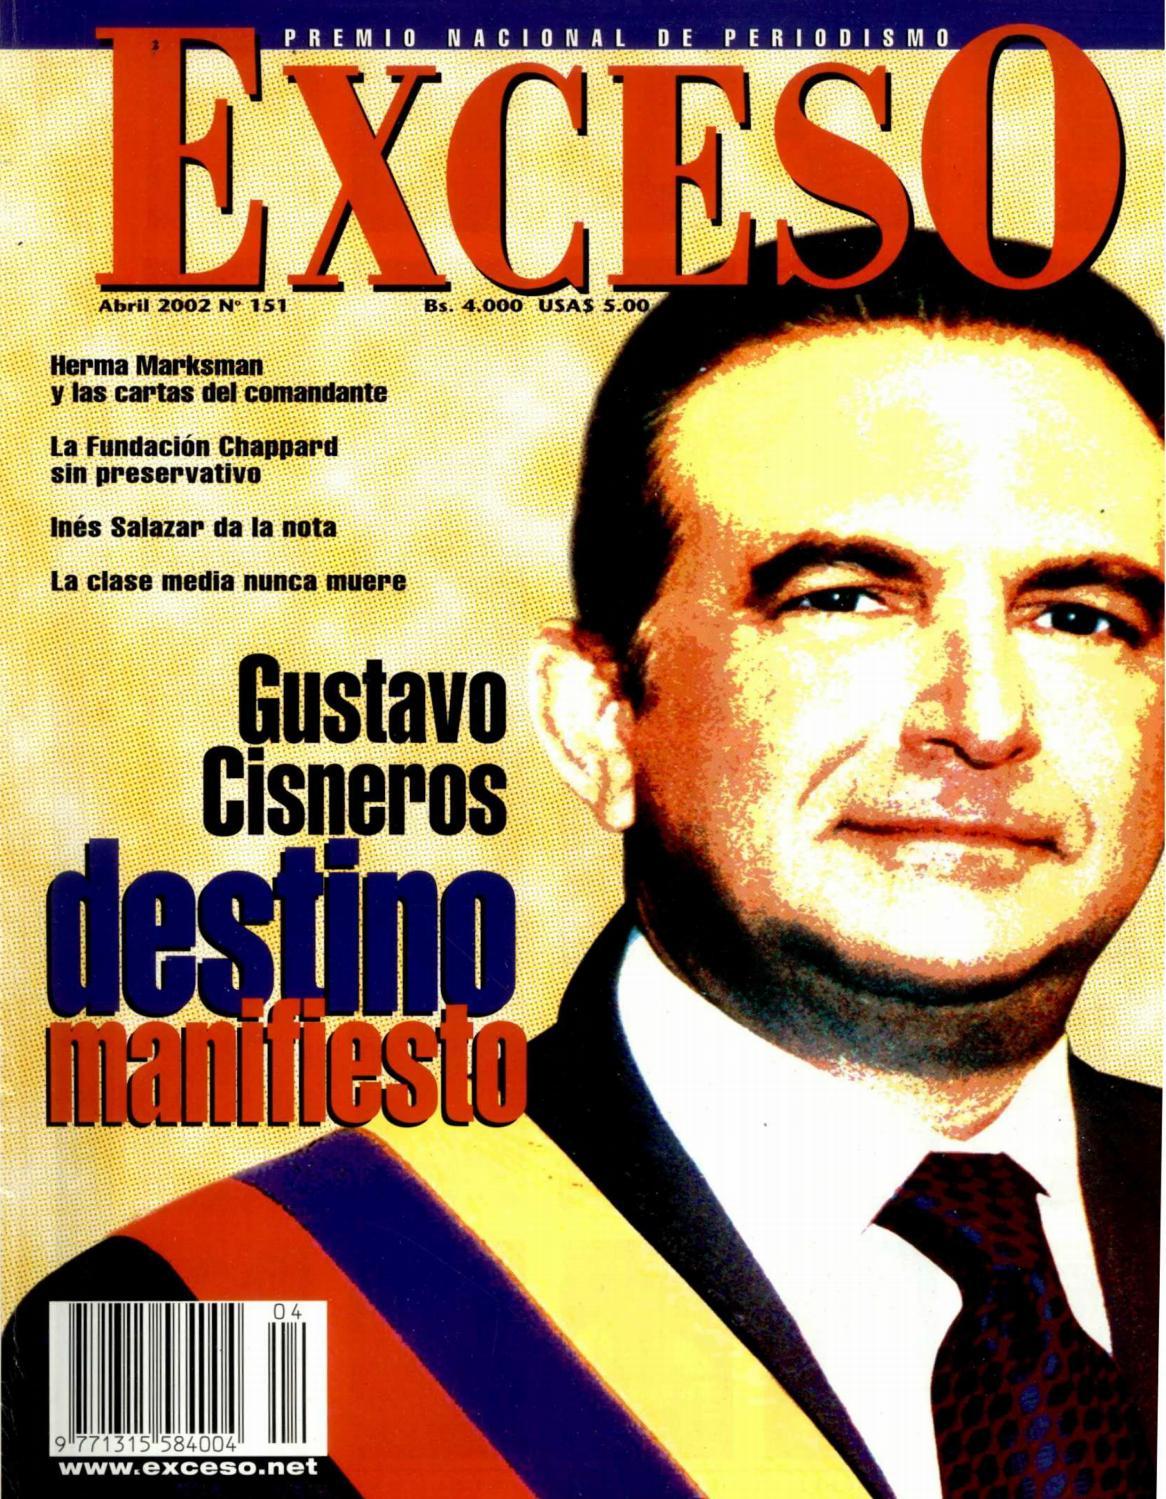 816b220dd0480 Revista Exceso edición nº 151 abril 2002 by Revista Exceso - 1988 a 2007 -  issuu